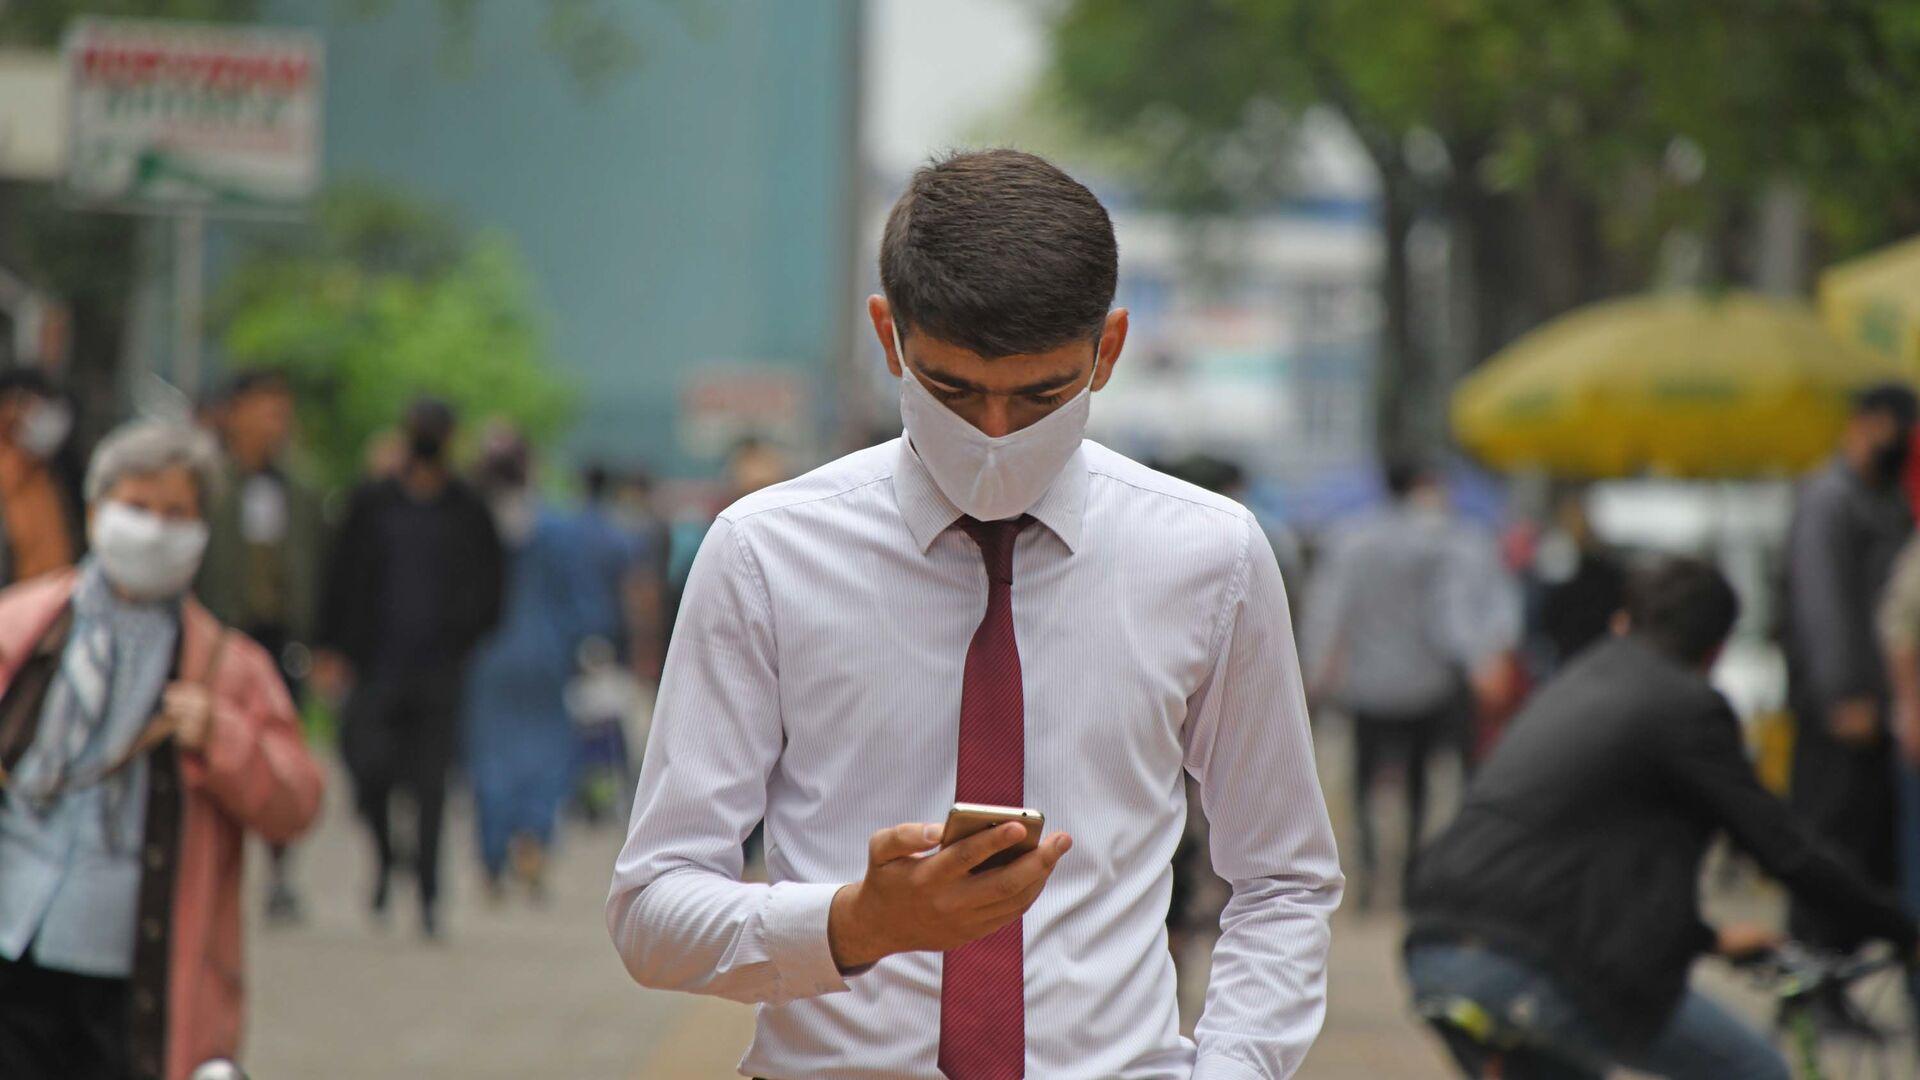 Мужчина в маске смотрит на телефон - Sputnik Таджикистан, 1920, 22.08.2021